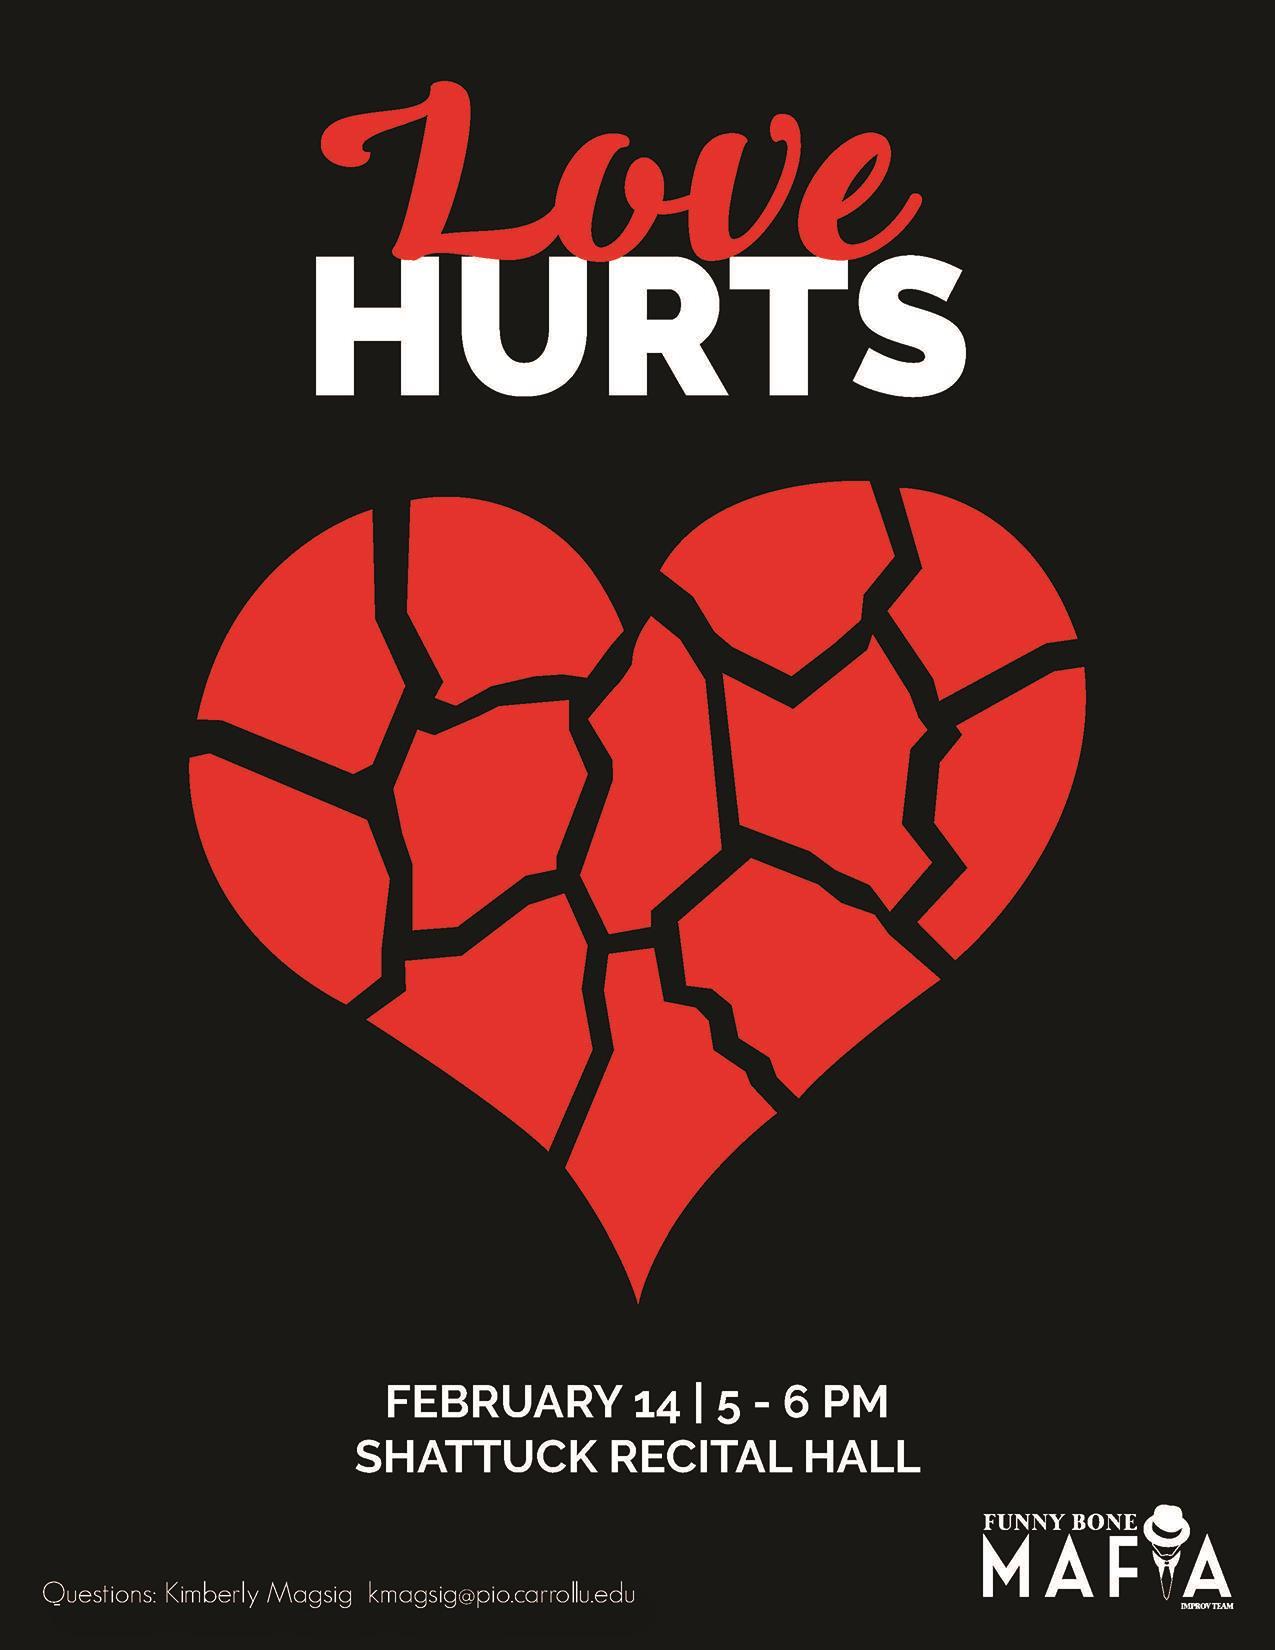 Love Hurts | Funny Bone Mafia Show